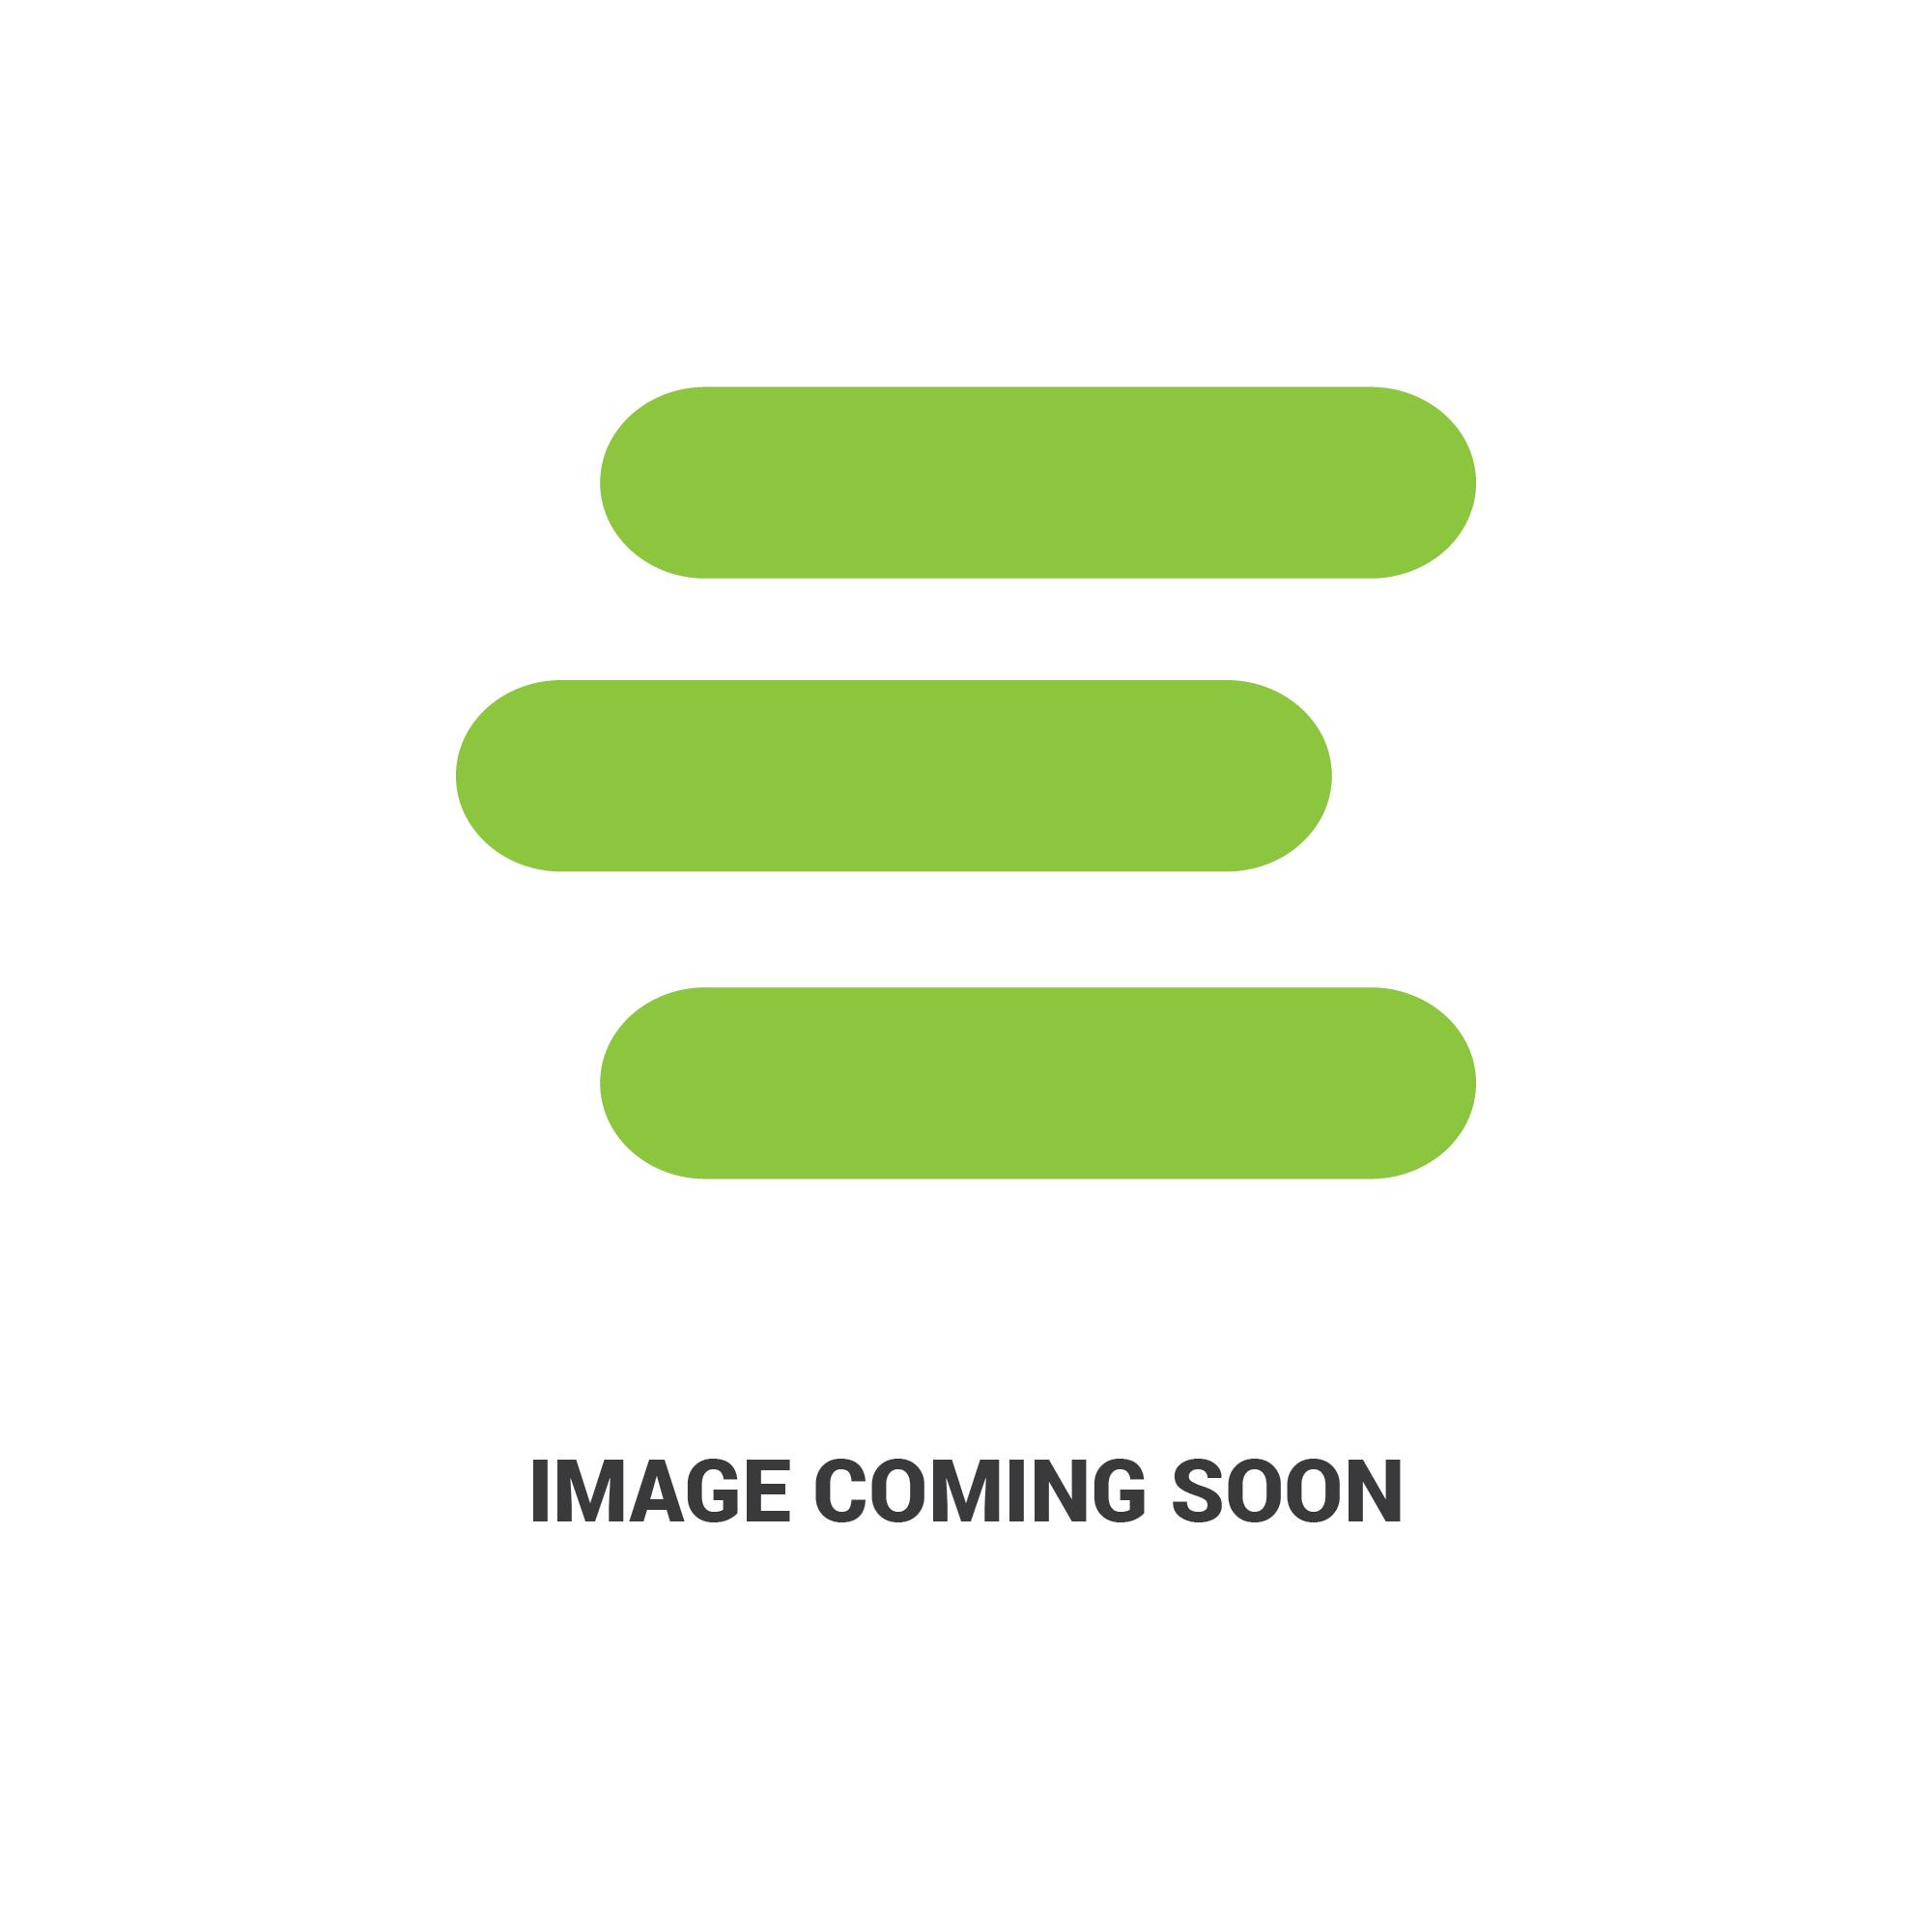 E-SP03edit 1.jpg